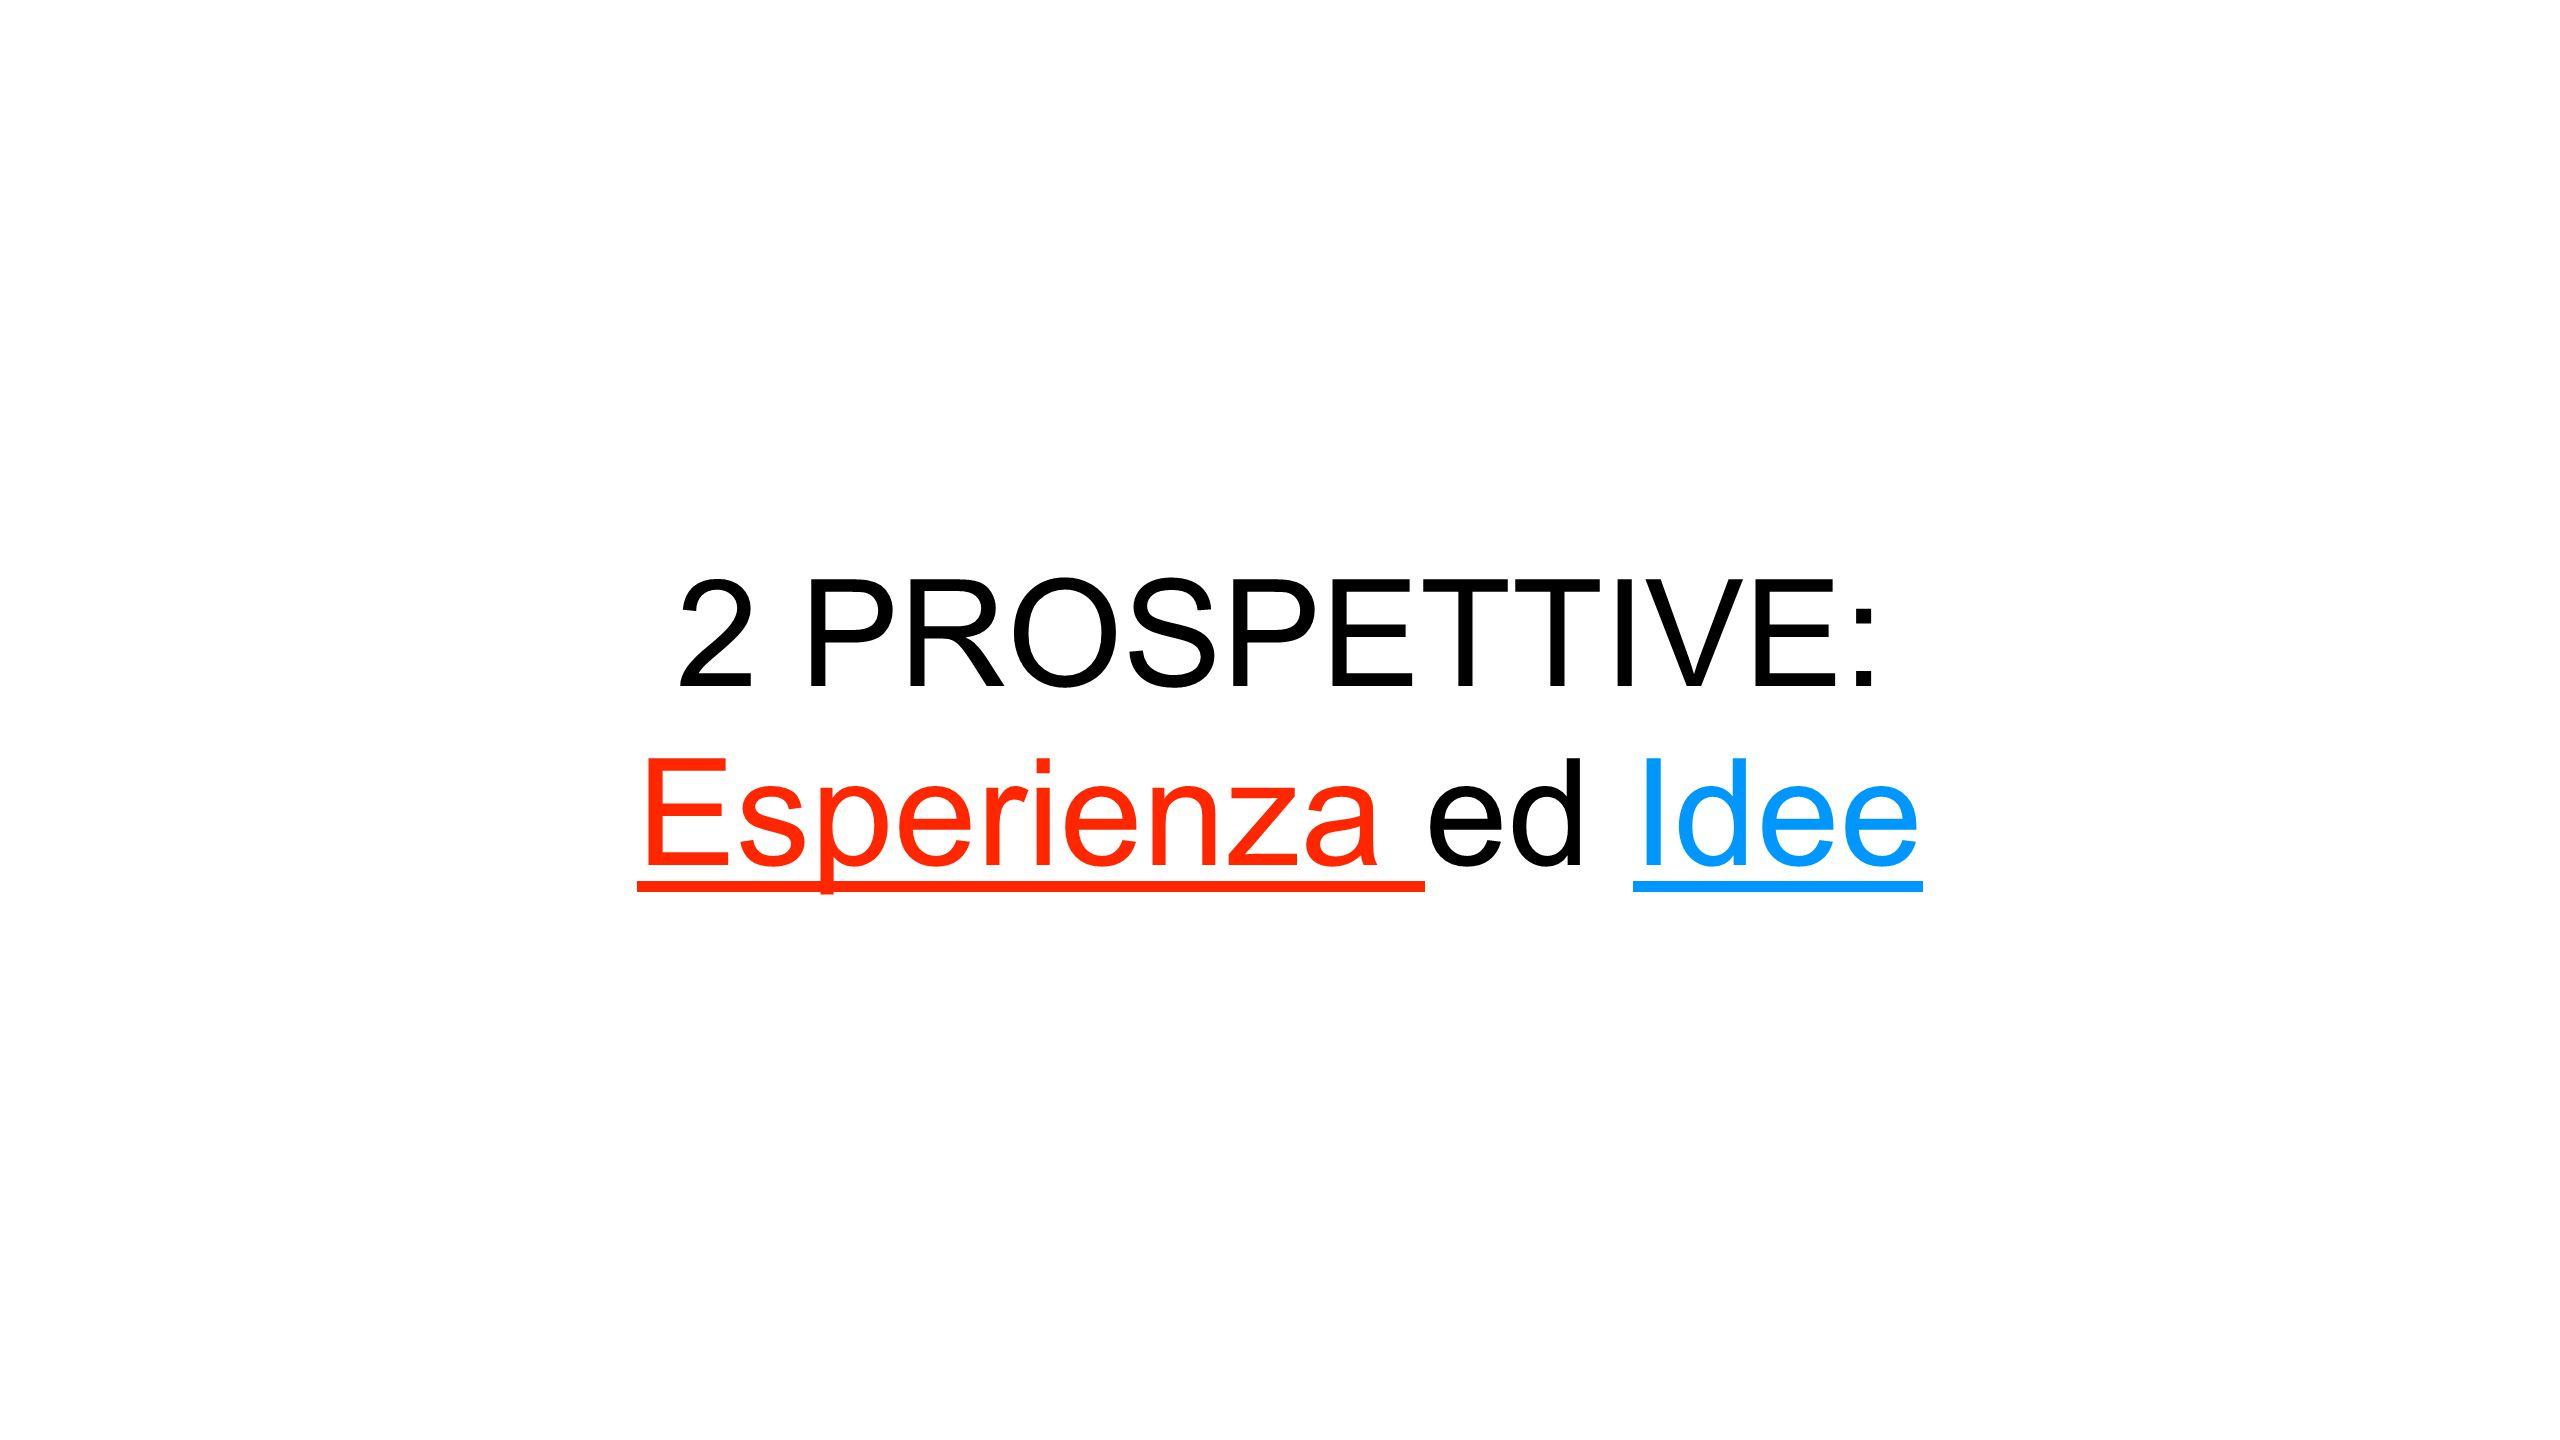 2 PROSPETTIVE: Esperienza ed Idee